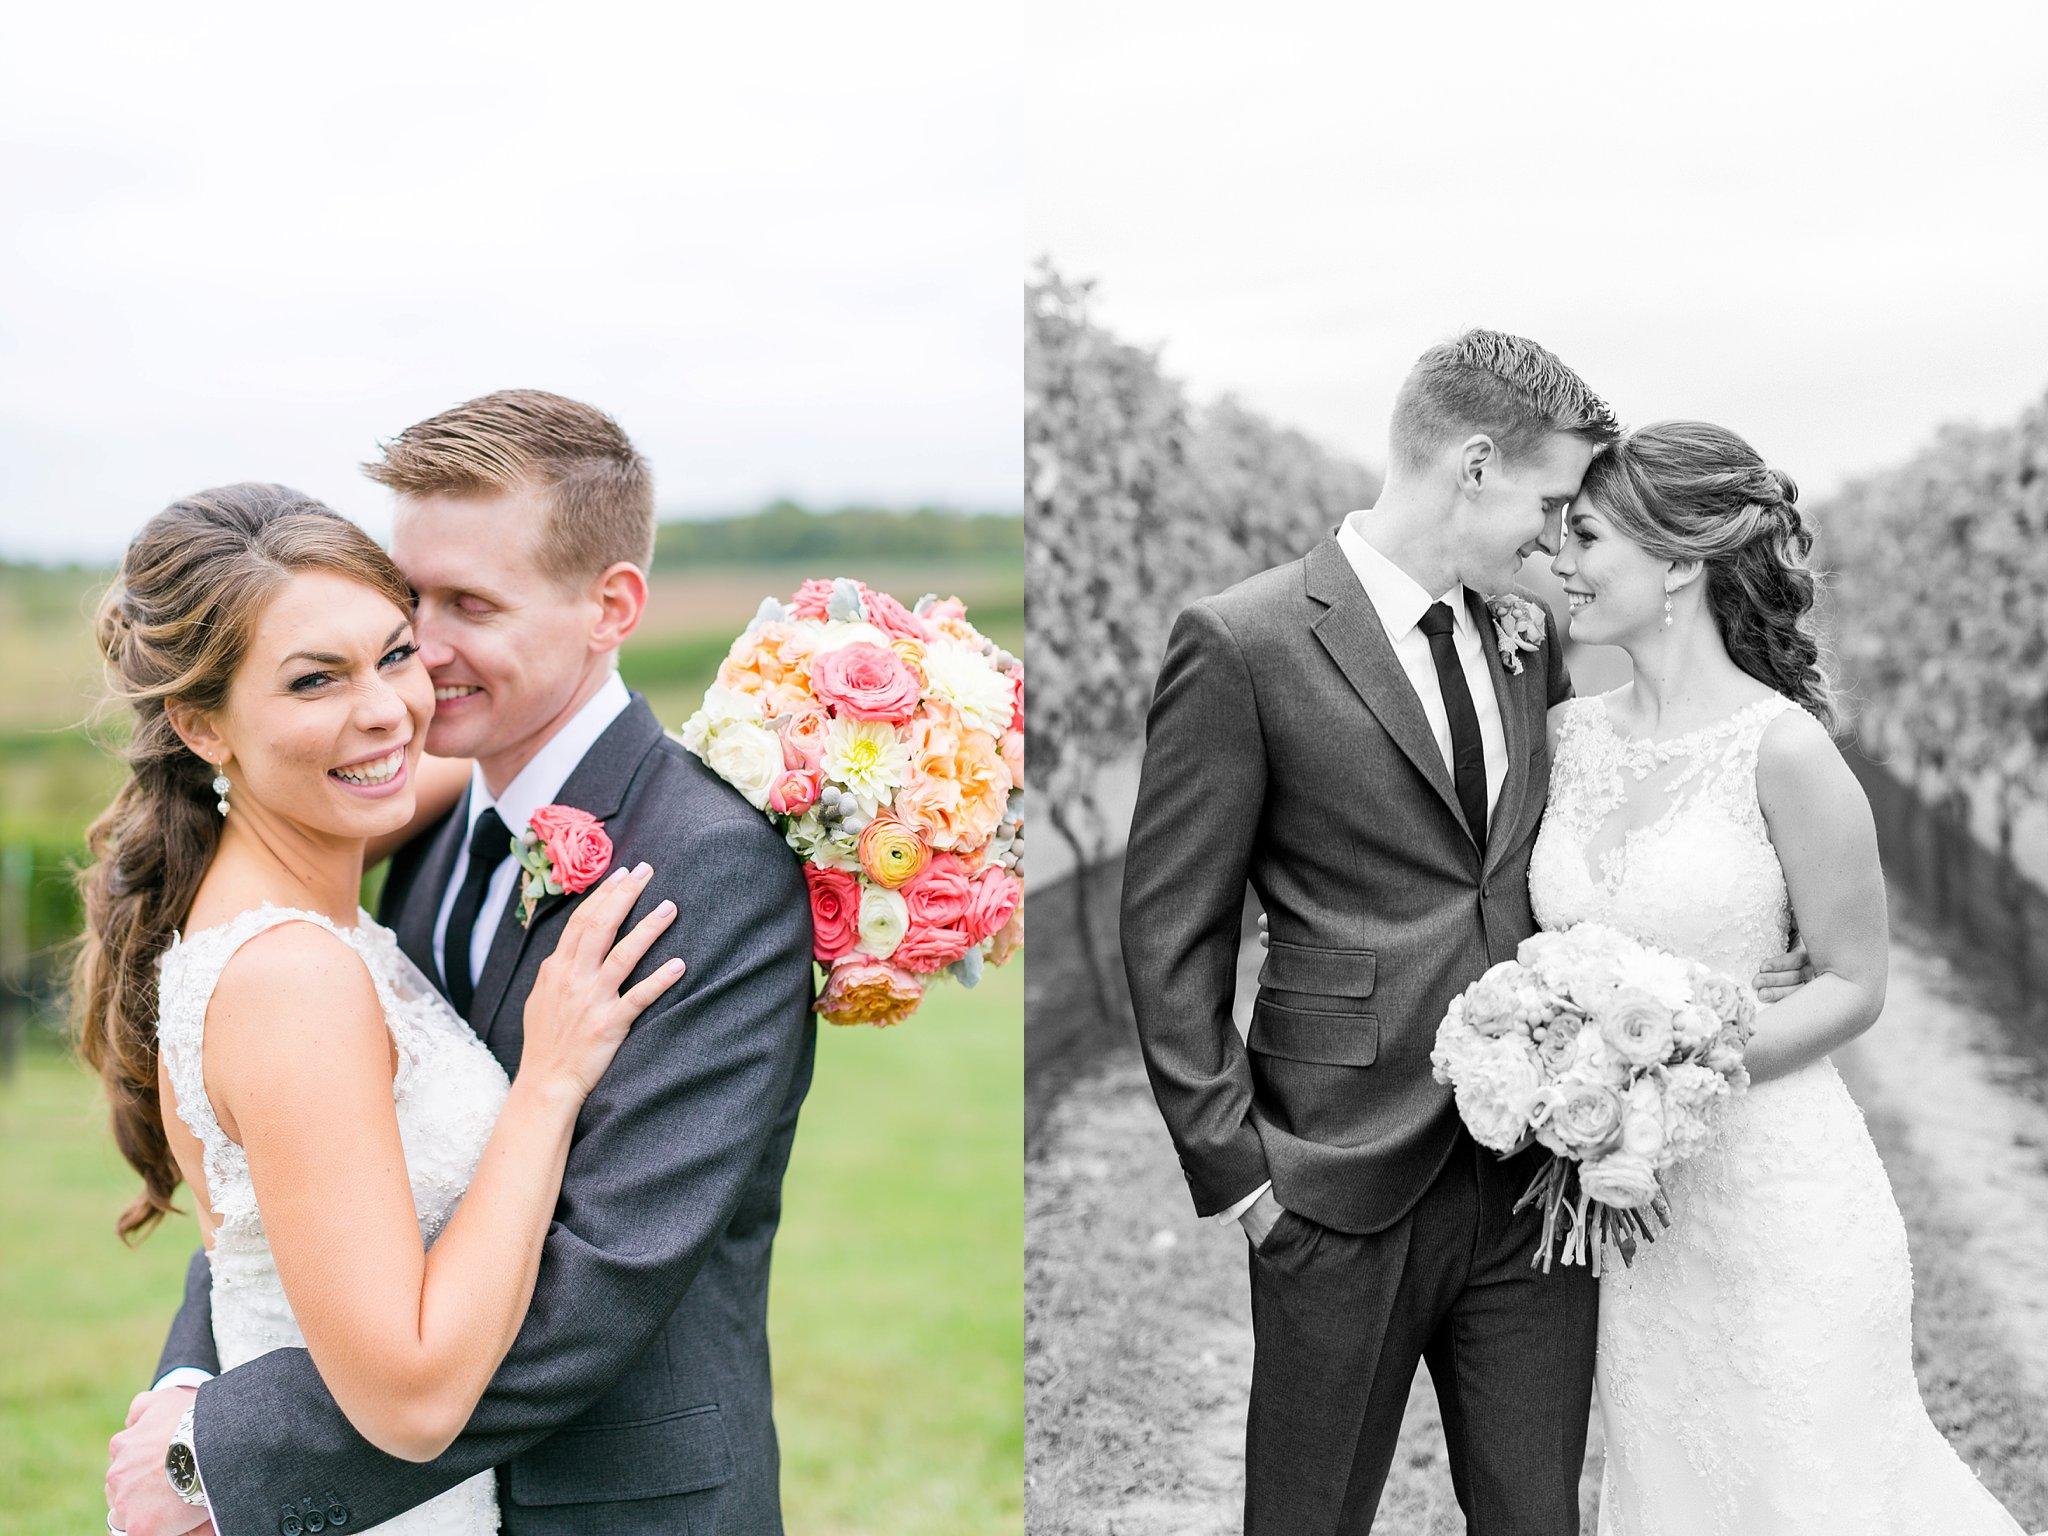 Stone Tower Winery Wedding Photos Virginia Wedding Photographer Megan Kelsey Photography Sam & Angela-230.jpg